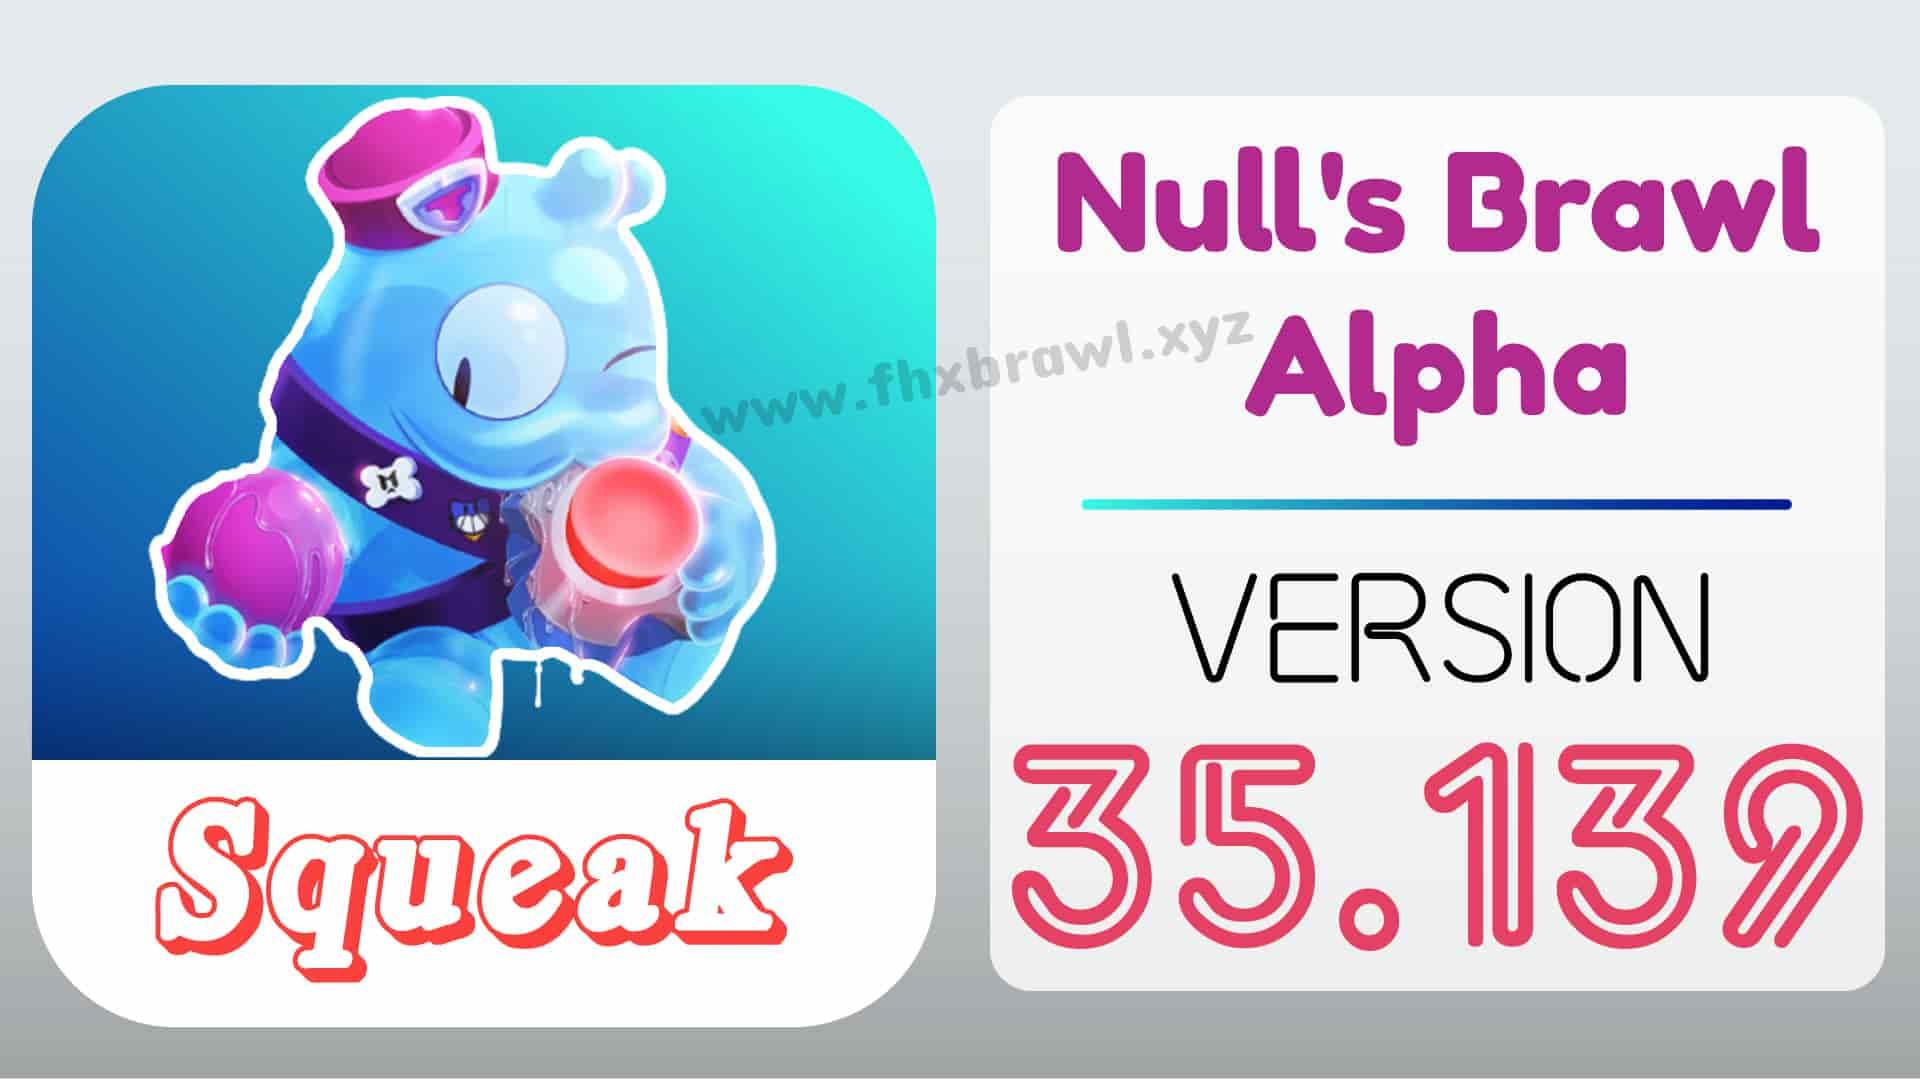 Null's Brawl 35.139 With New Brawler Squeak